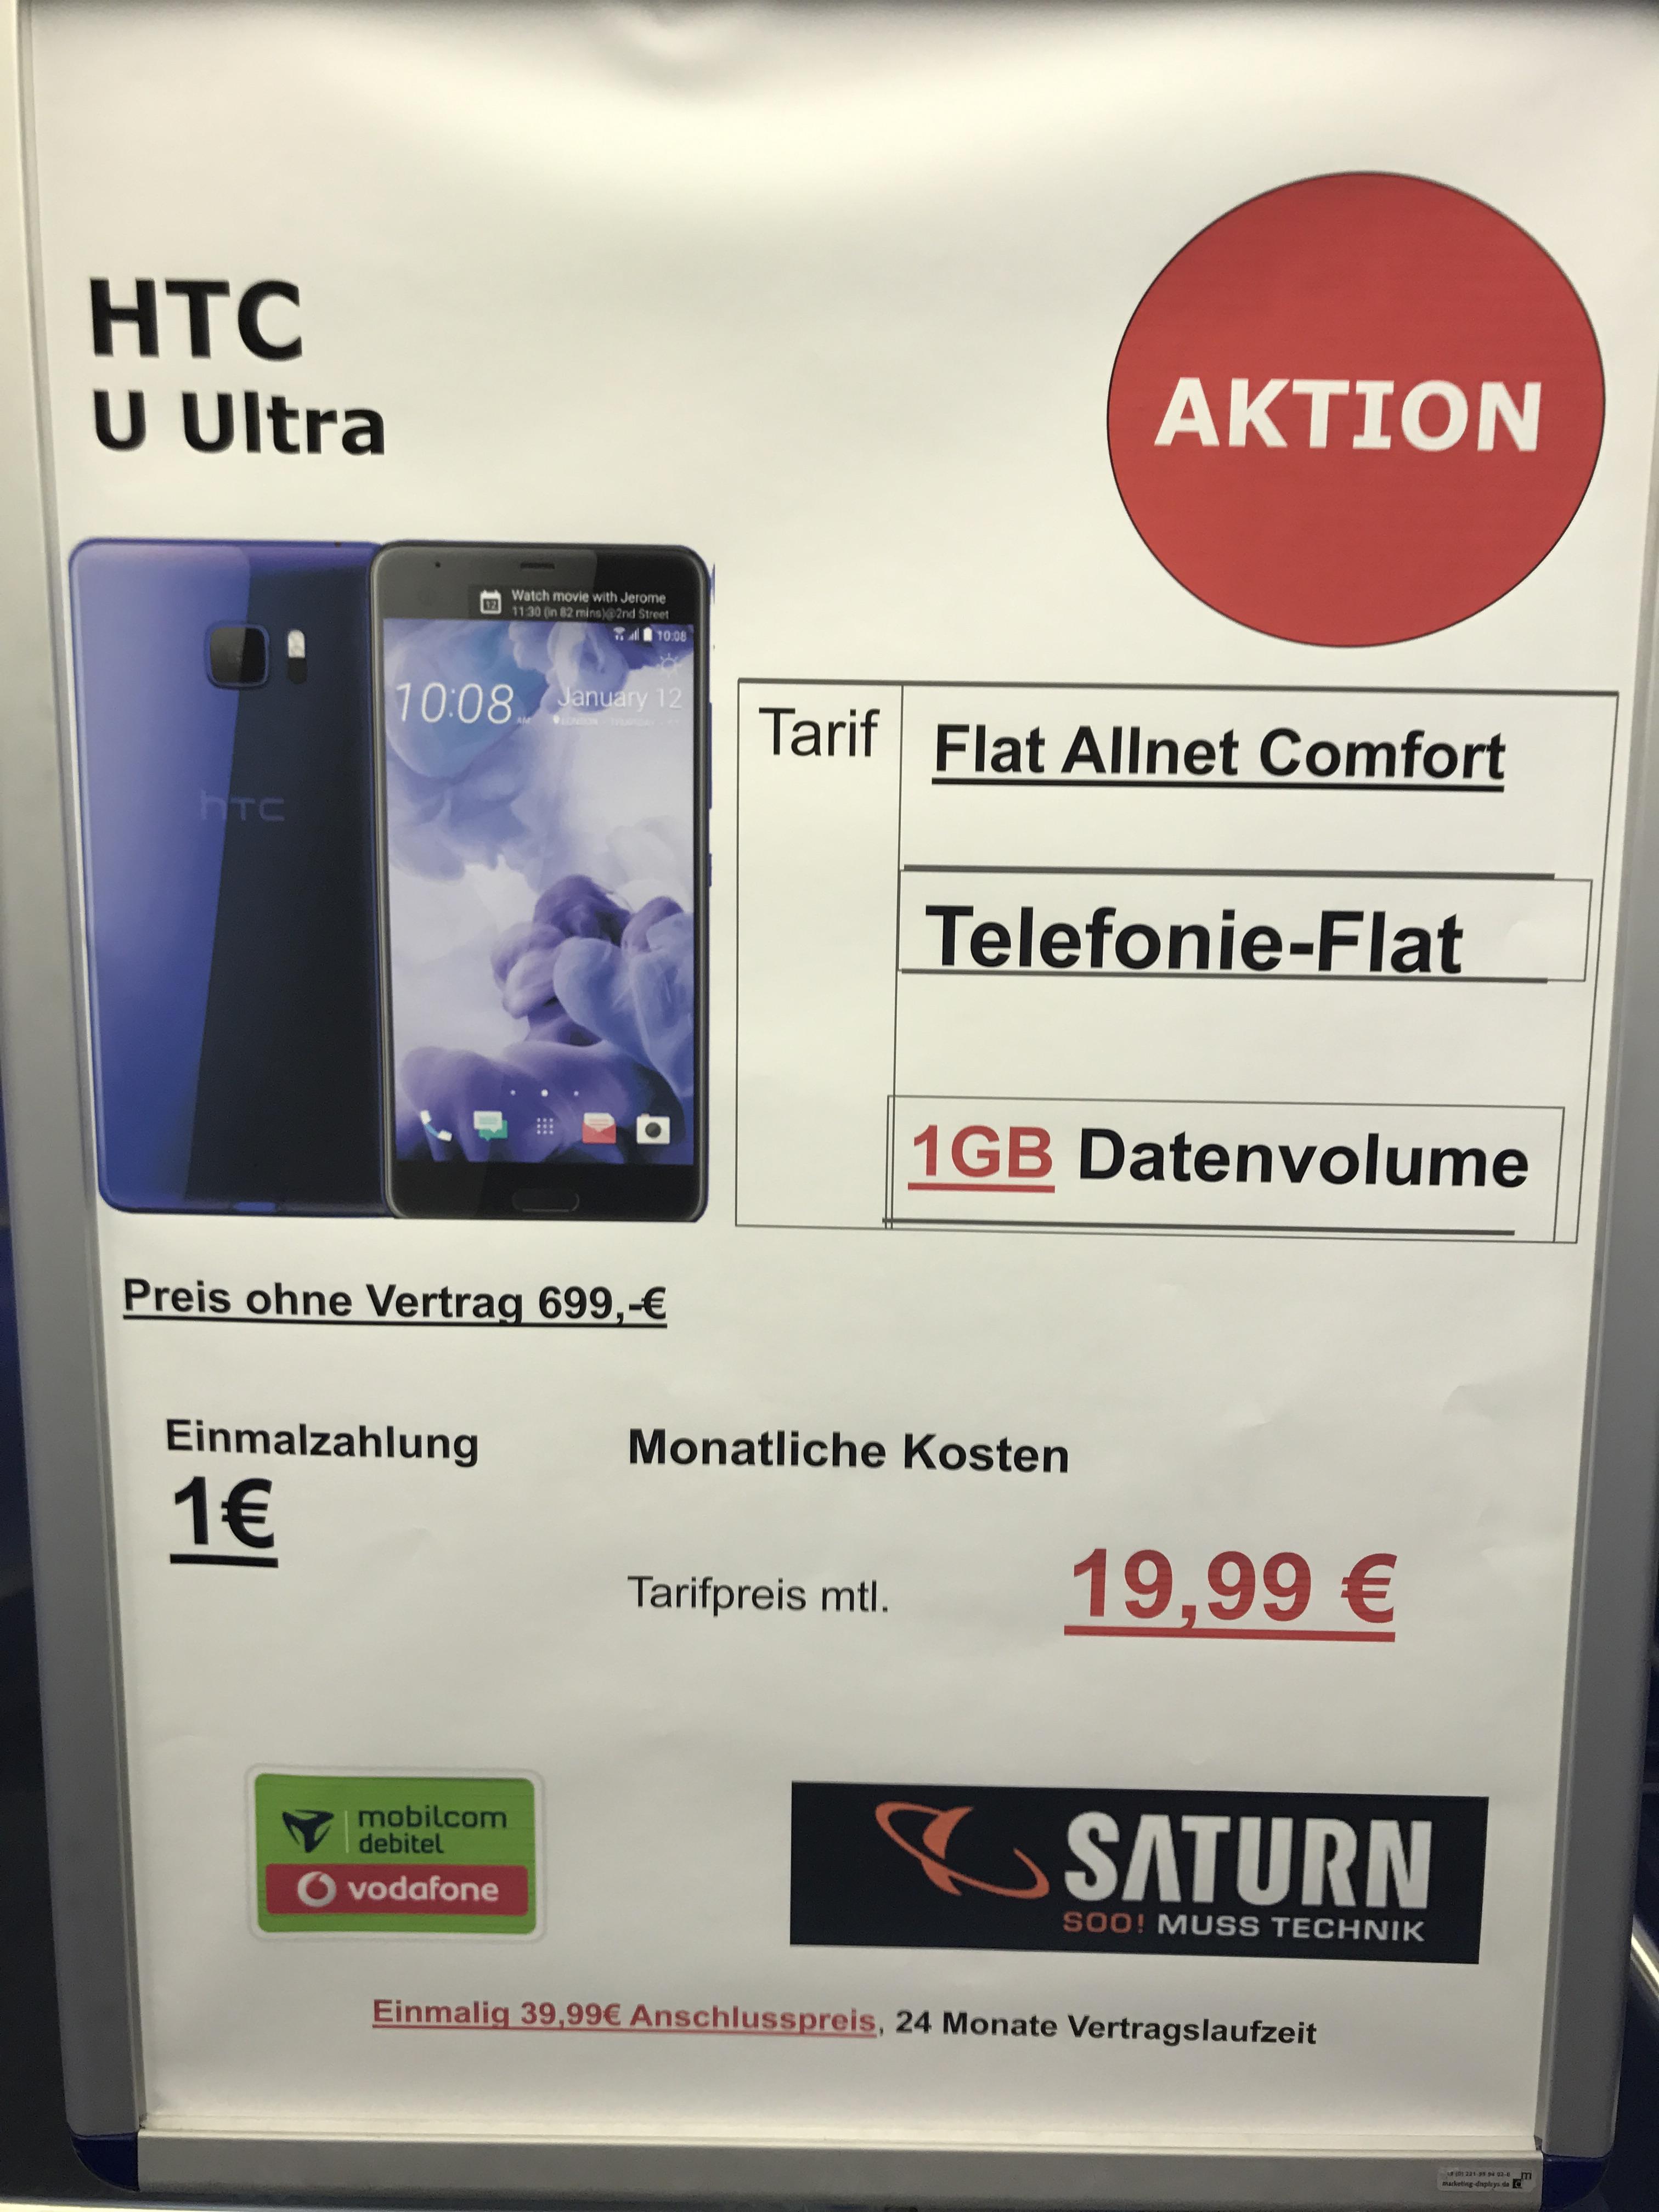 HTC U ULTRA 1€ Mtl.19,99€